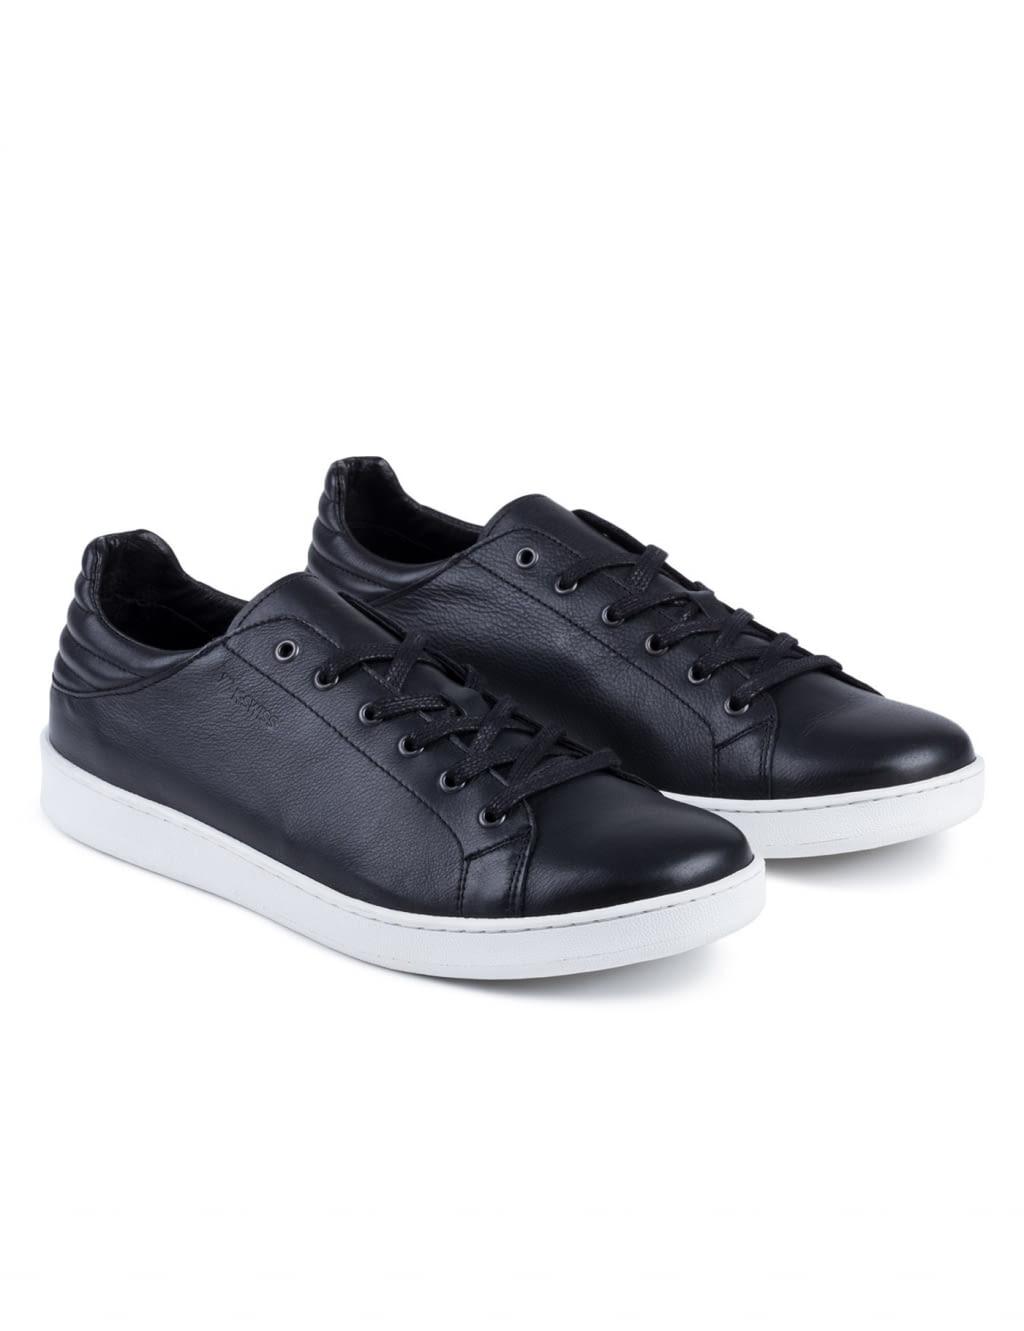 k swiss shoes indonesia bali girl